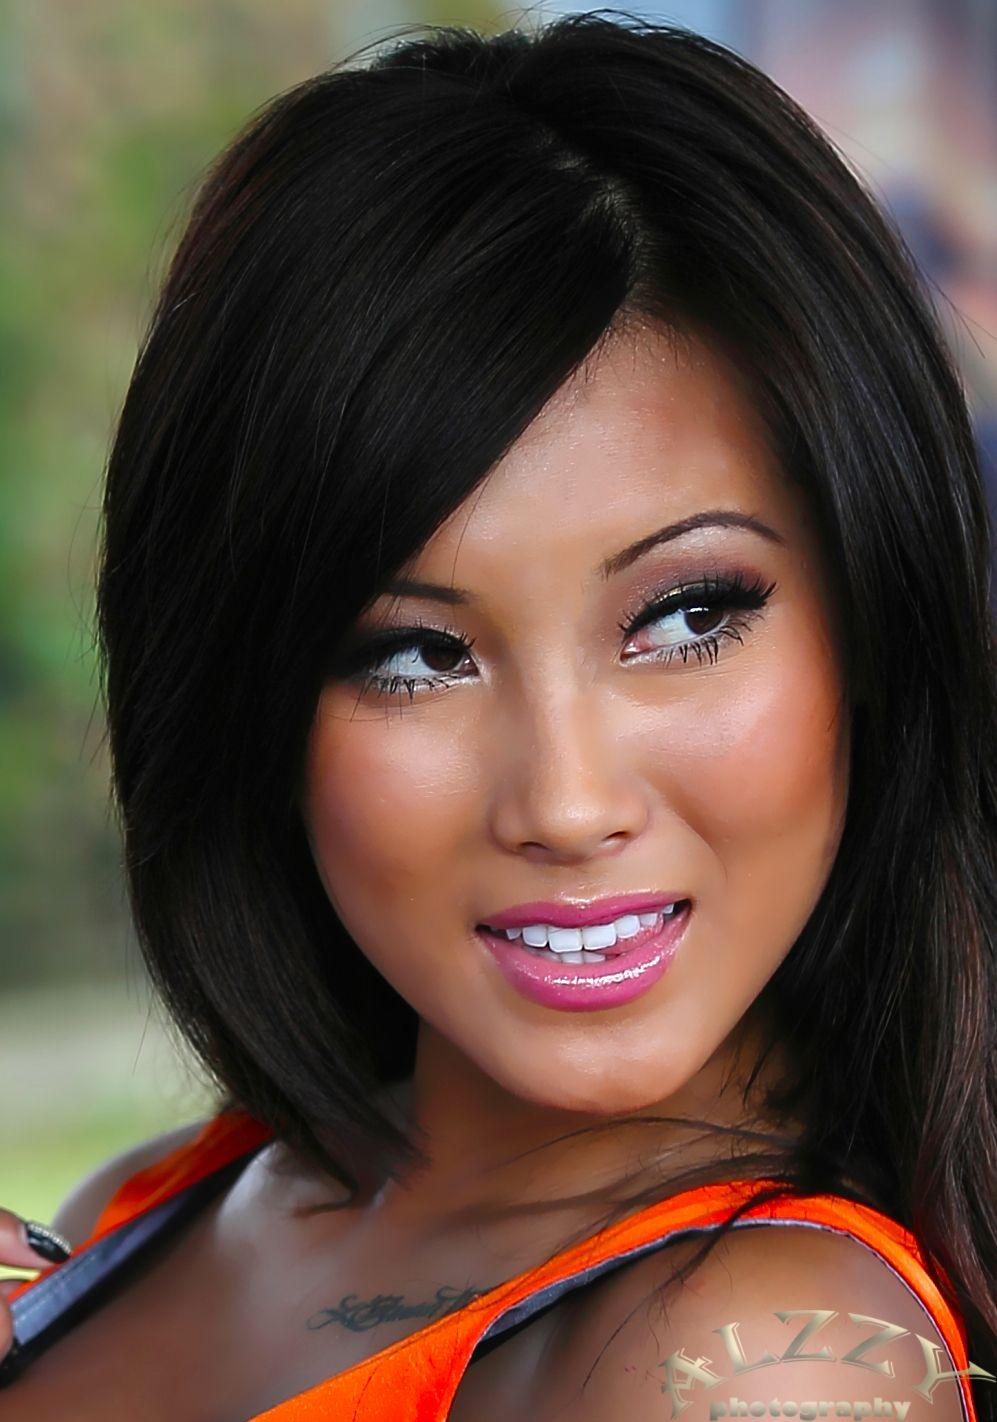 rascal pick - amy fay - busty - asian beauty - long hair - black